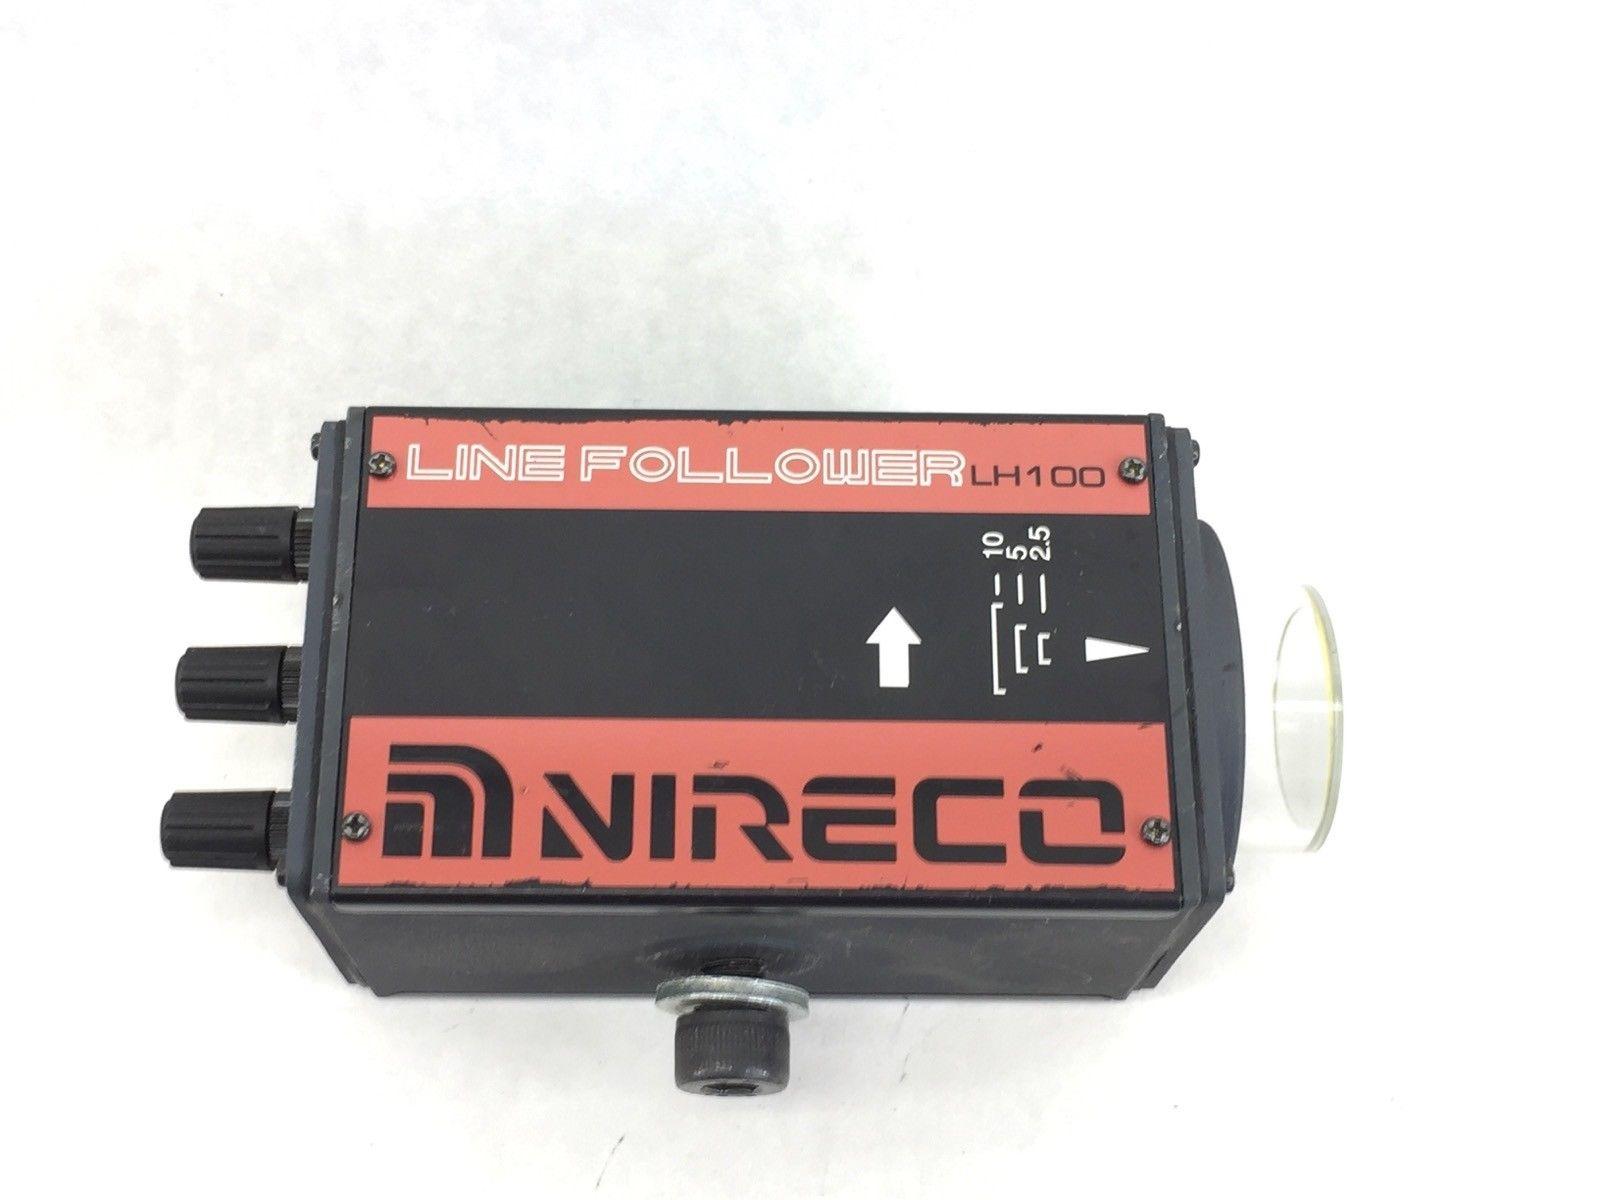 NIRECO LINE FOLLOWER HEAD LH100 (H296) 1